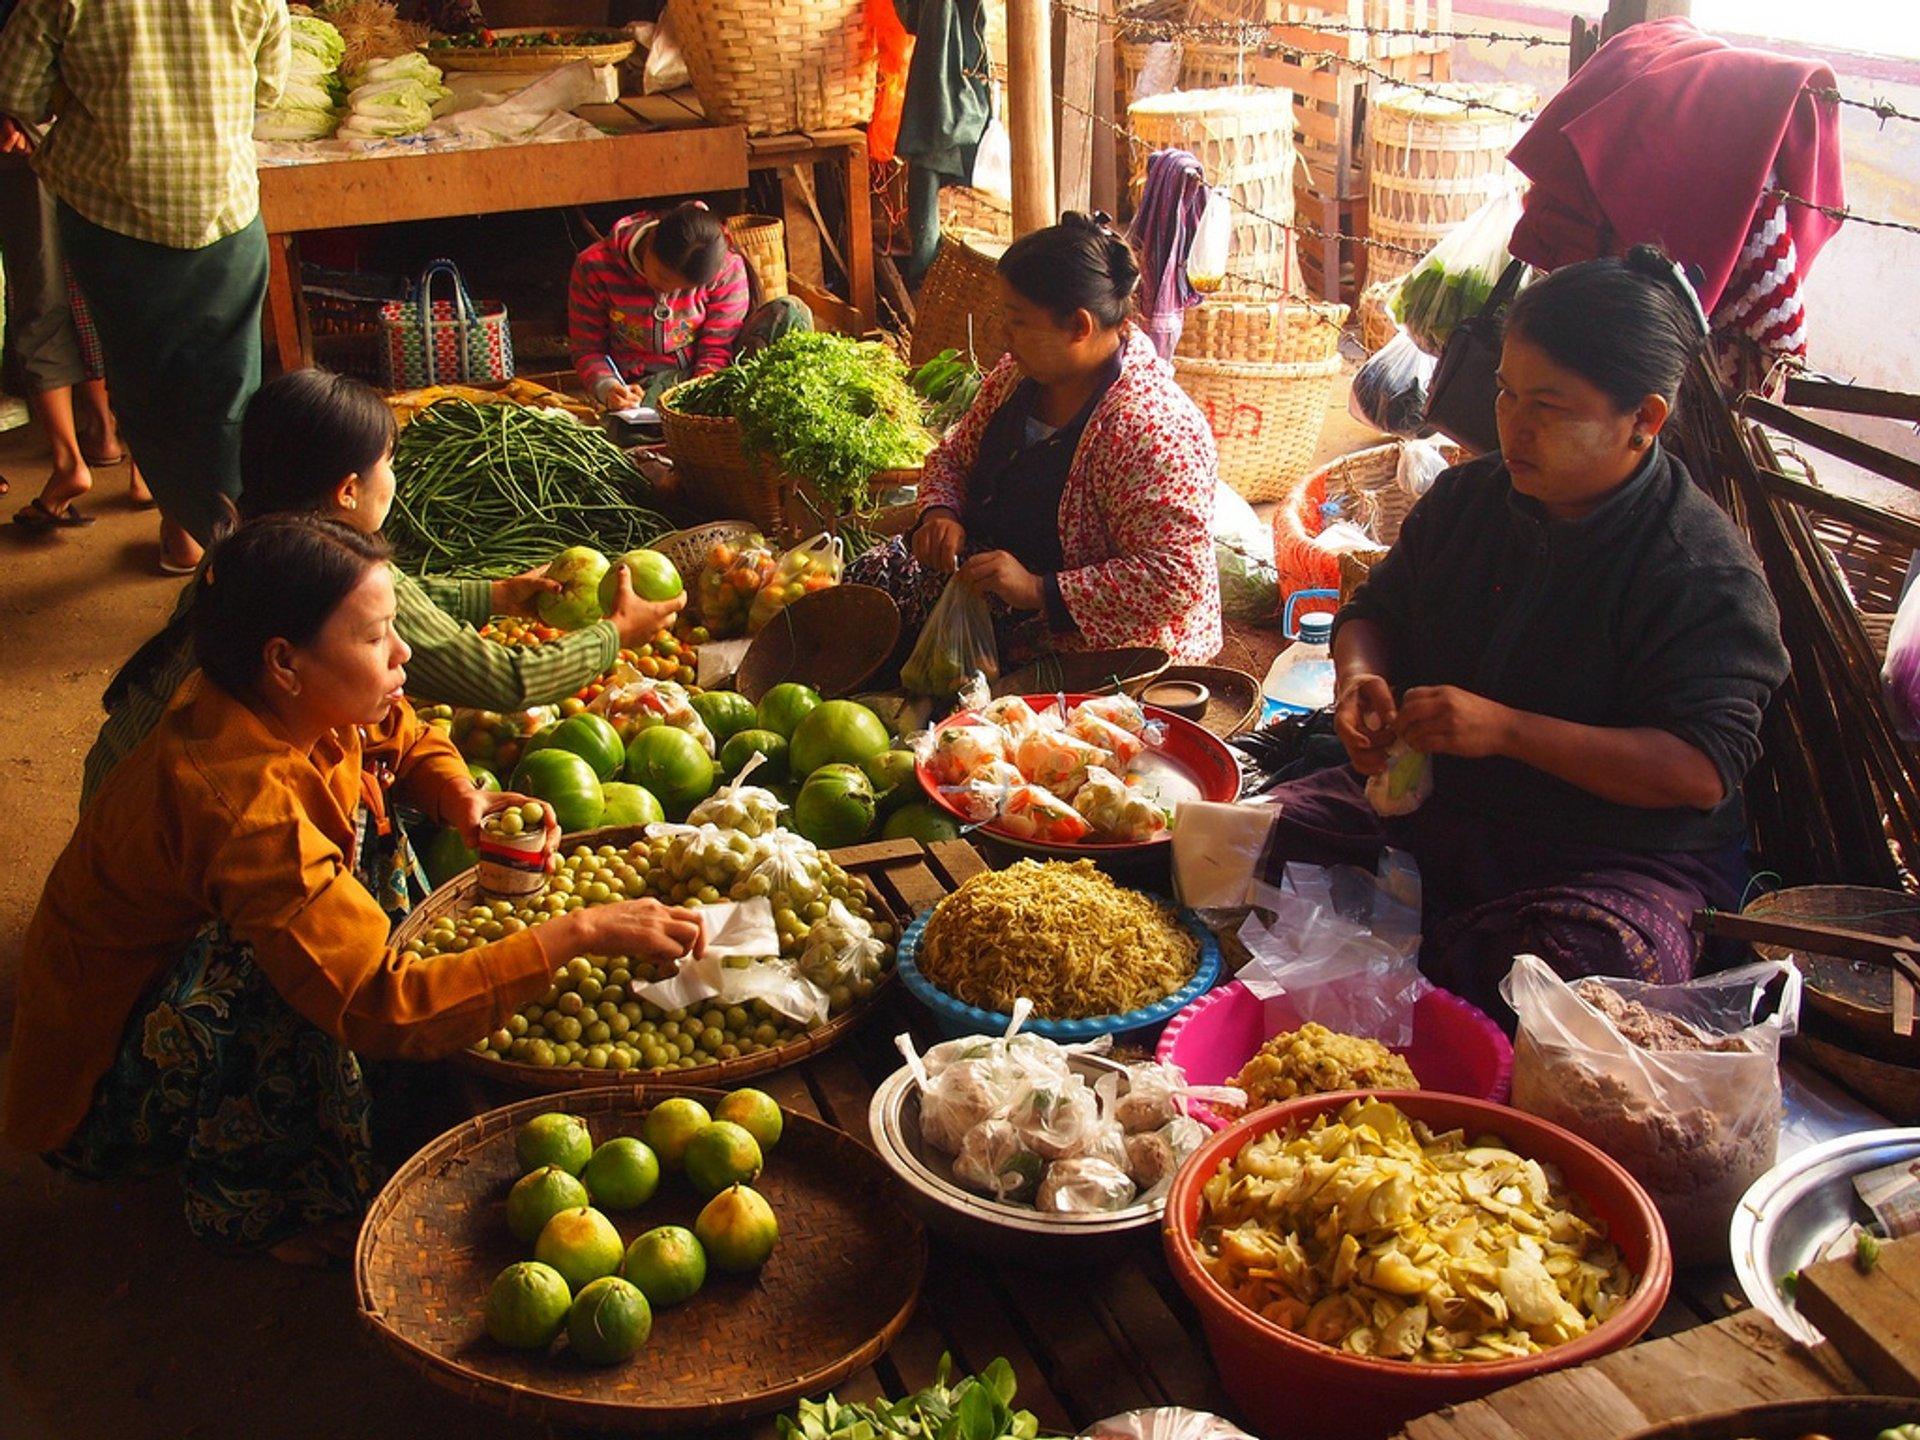 Ananda Pagoda Festival in Myanmar - Best Season 2020